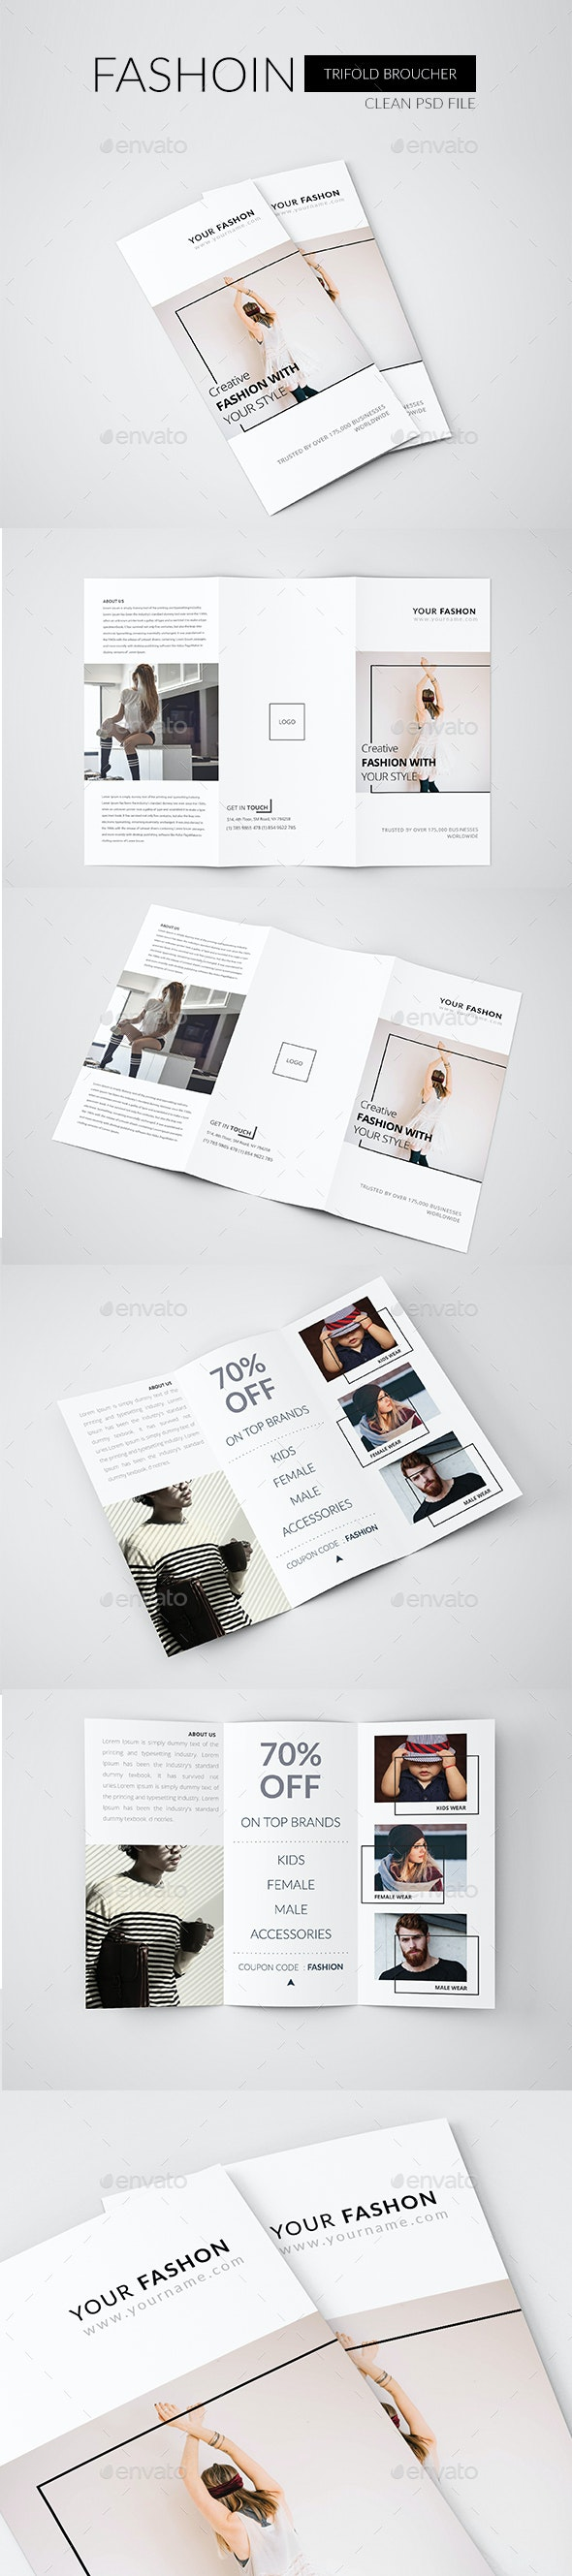 Fashion Trifold Brochure - Brochures Print Templates